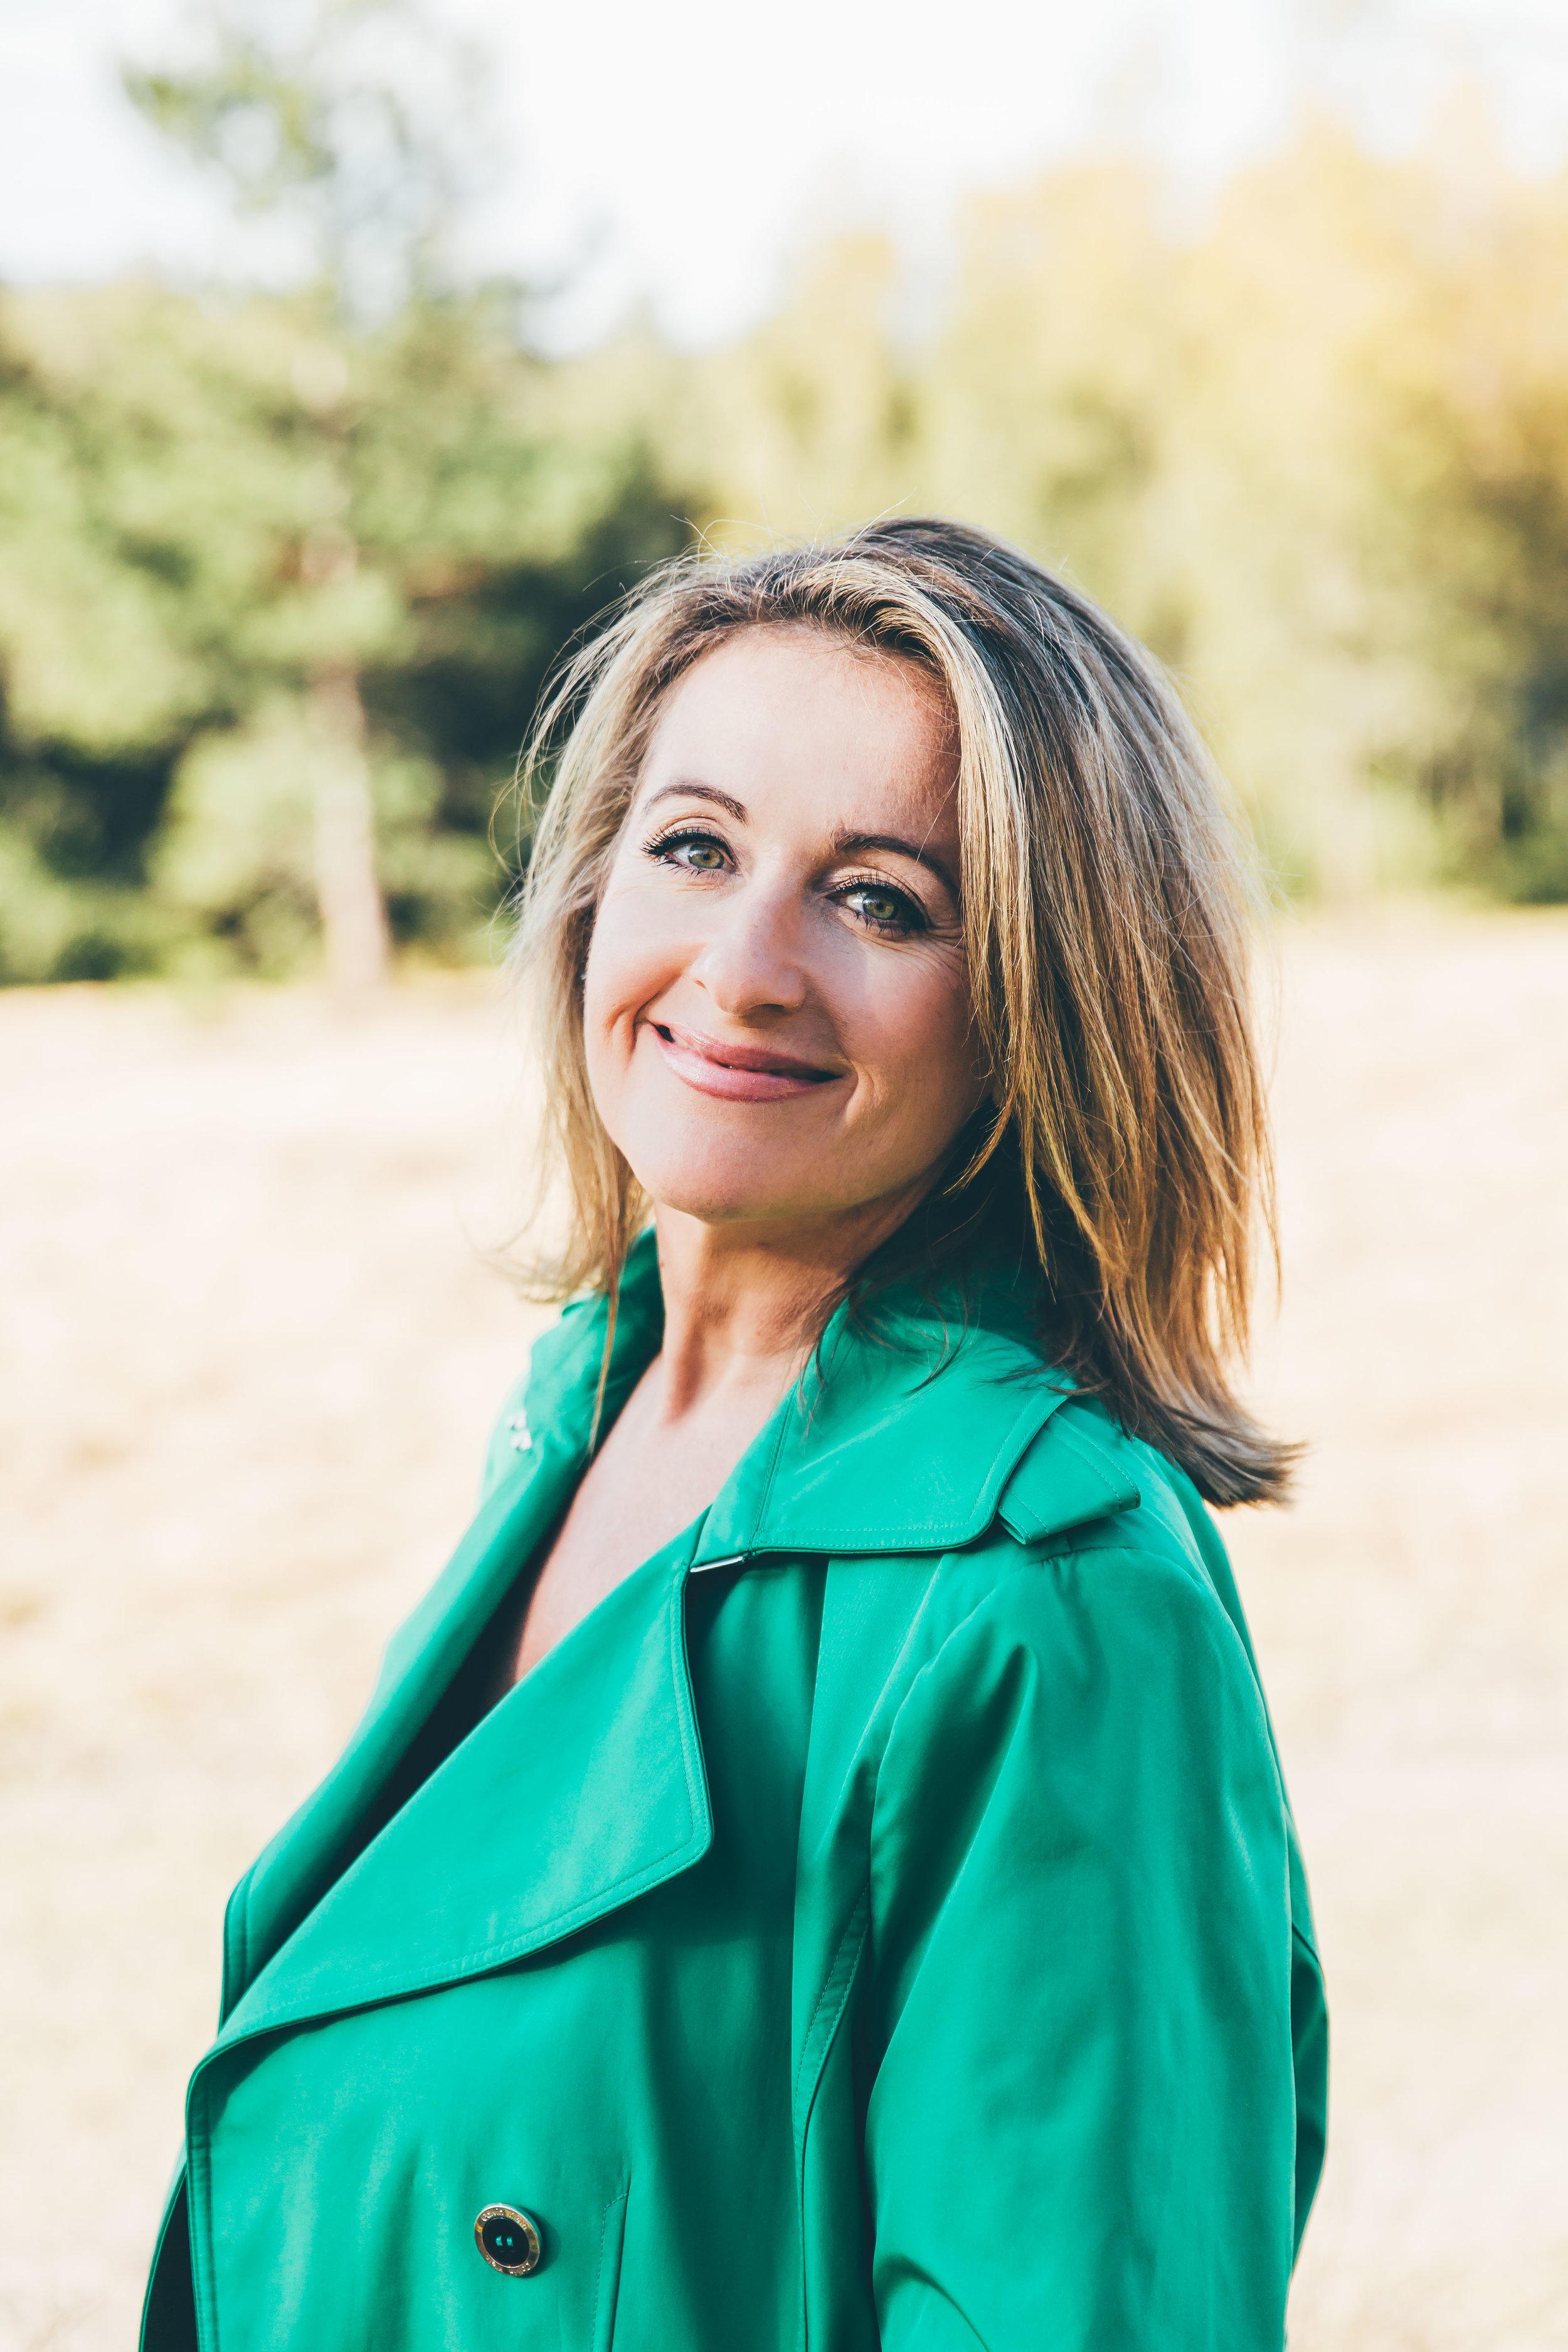 Sonia McNaughton Newcastle Naturopath Nutritionist Medical Herbalist Mayfield Women's Hormones Thyroid Health Hashimoto's Grave's Disease Hypothyroidism Hyperthyroidism